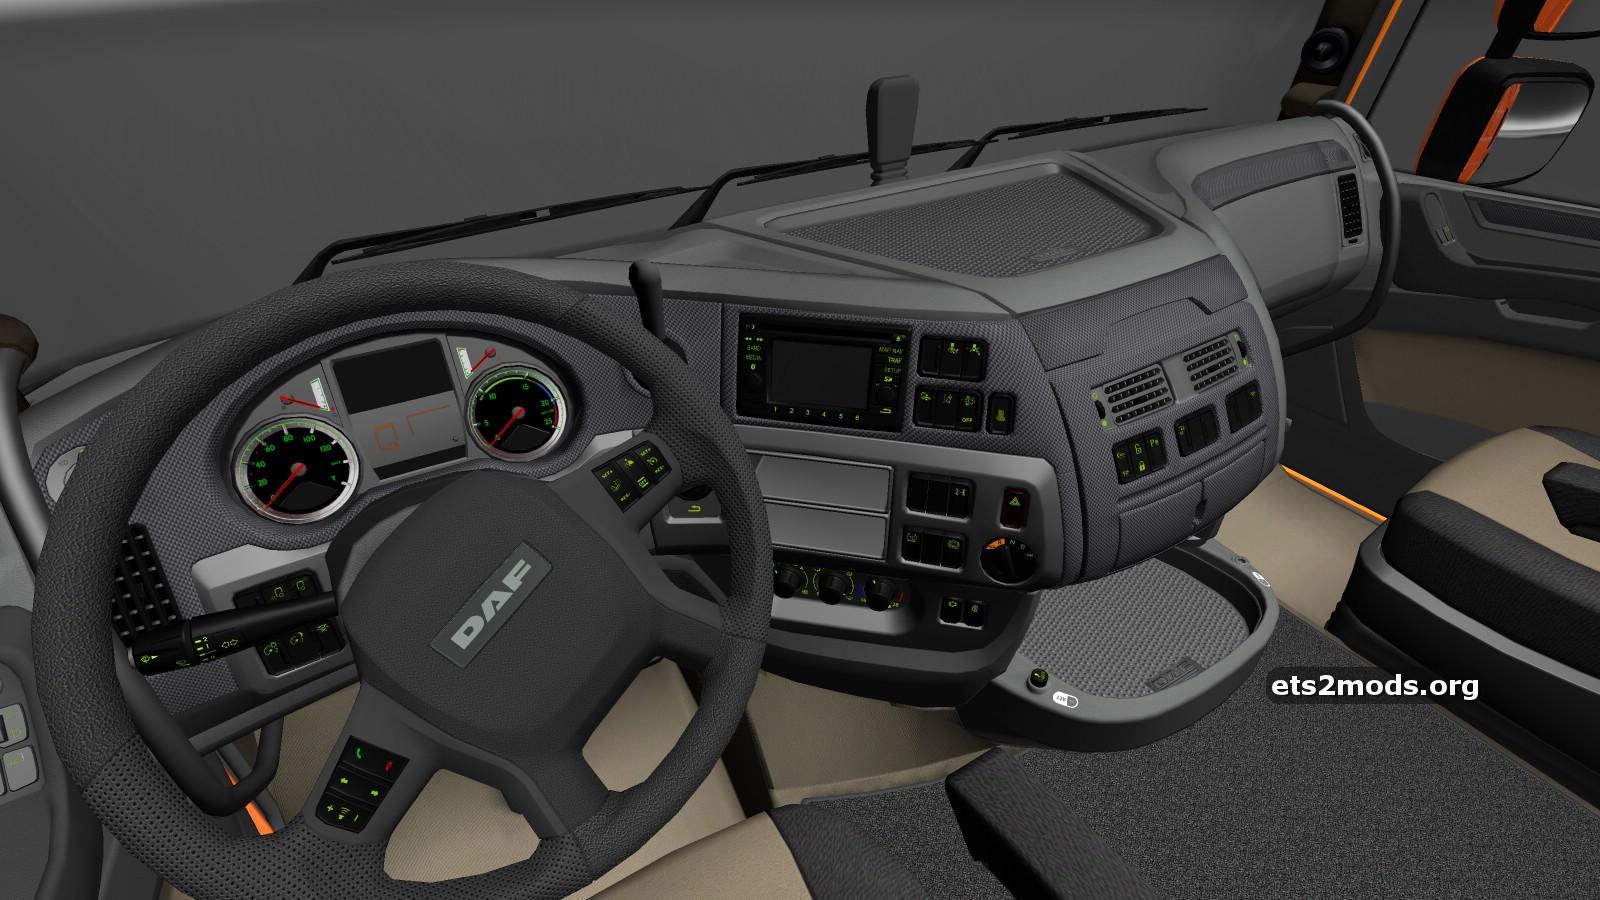 Daf euro 6 dark gray interior ets2 mods for Daf euro 6 interieur